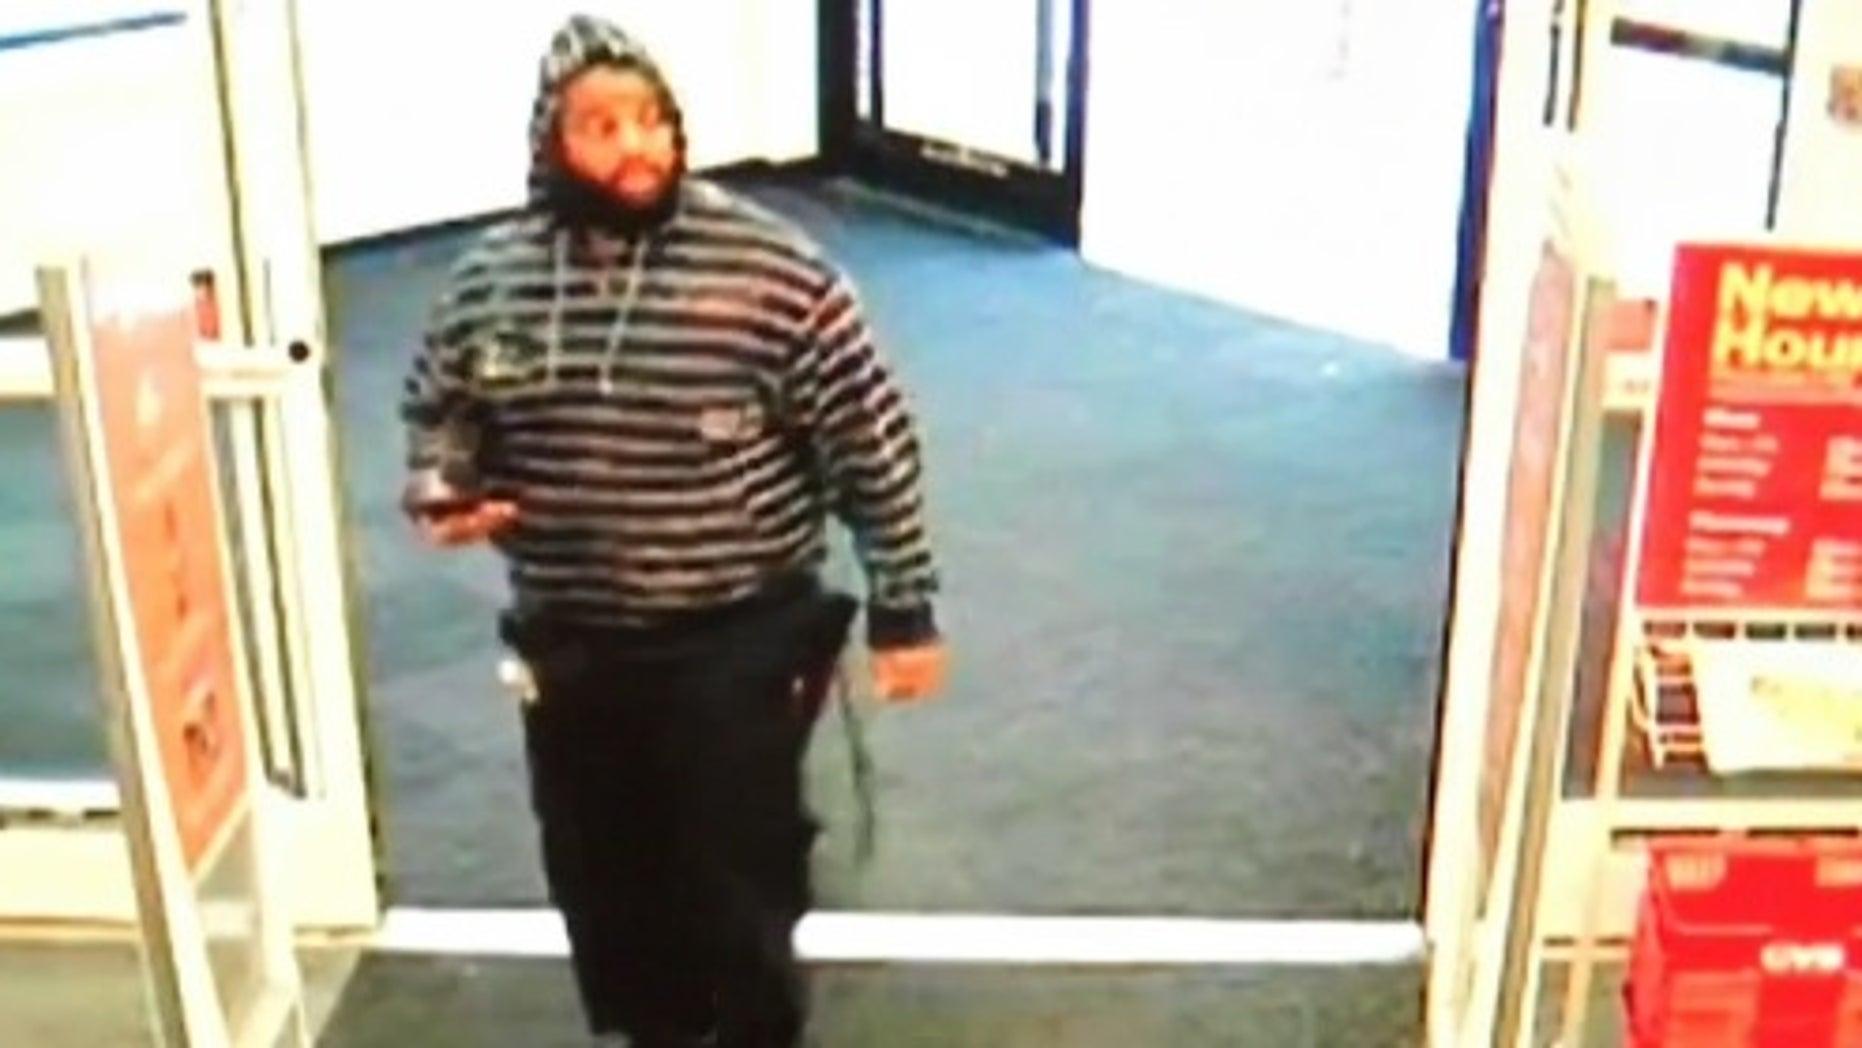 Usaamah Rahim had been under 24-hour surveillance for several months.